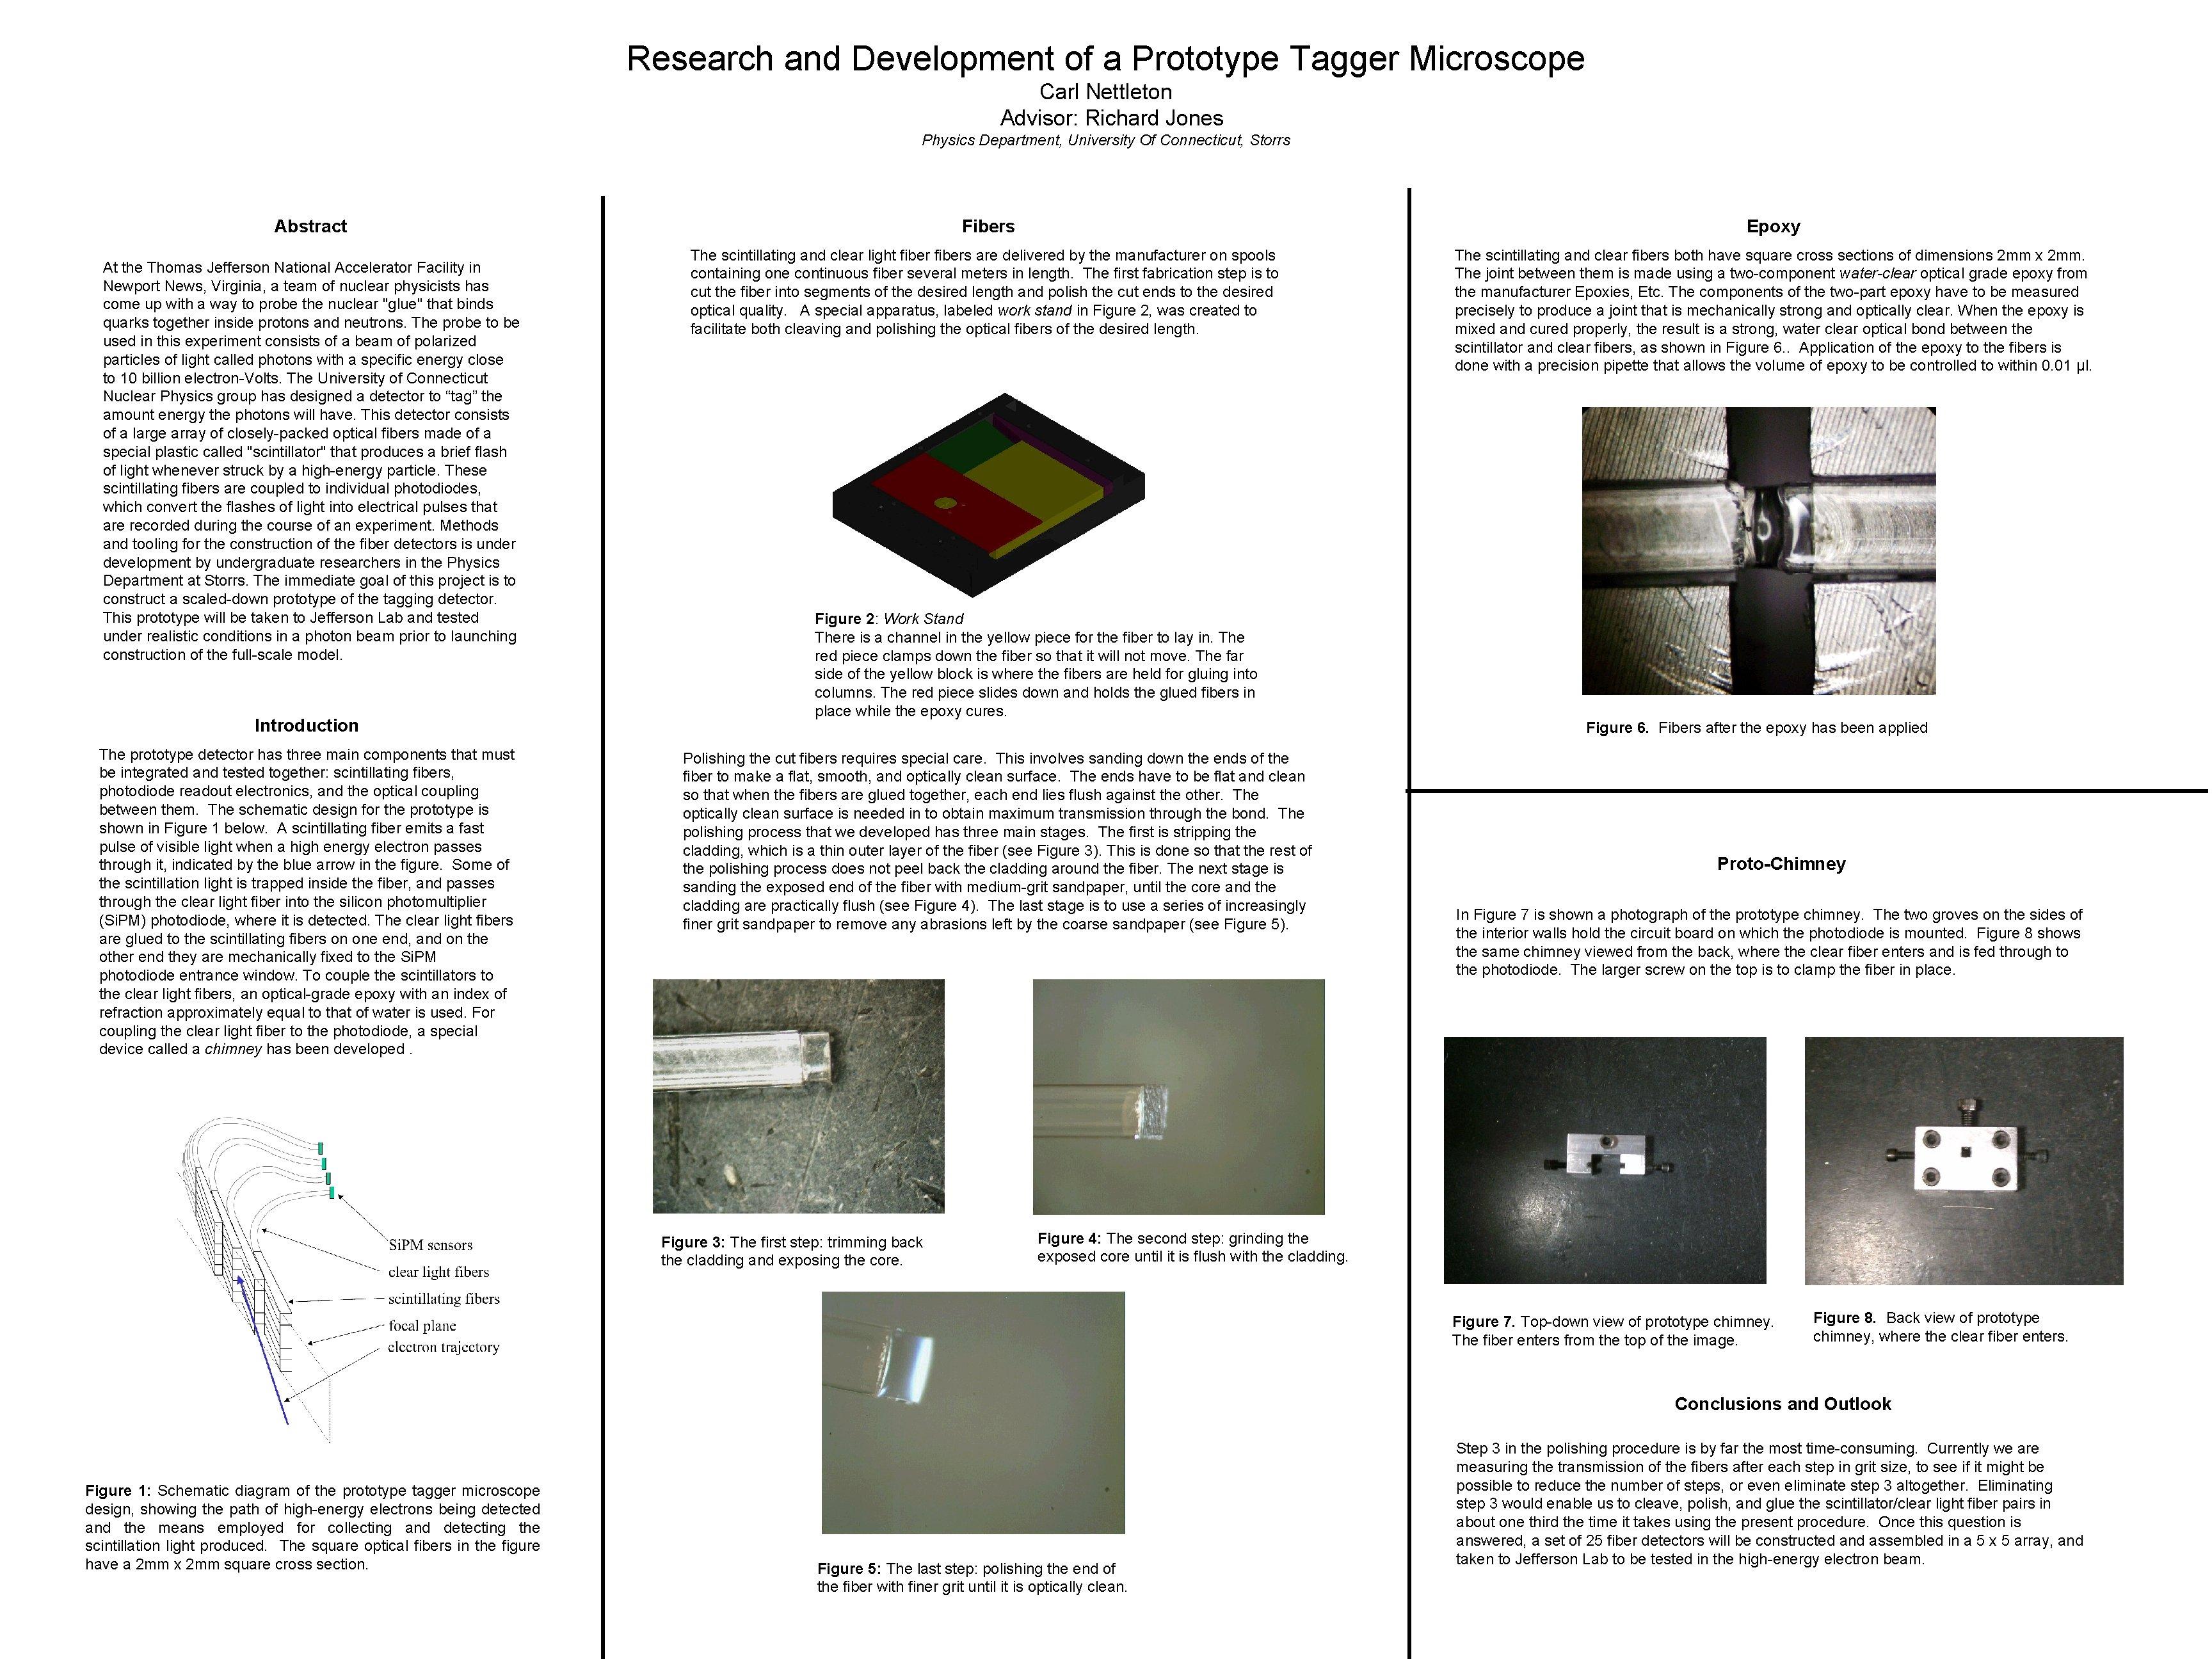 Research and Development of a Prototype Tagger Microscope Carl Nettleton Advisor: Richard Jones Physics